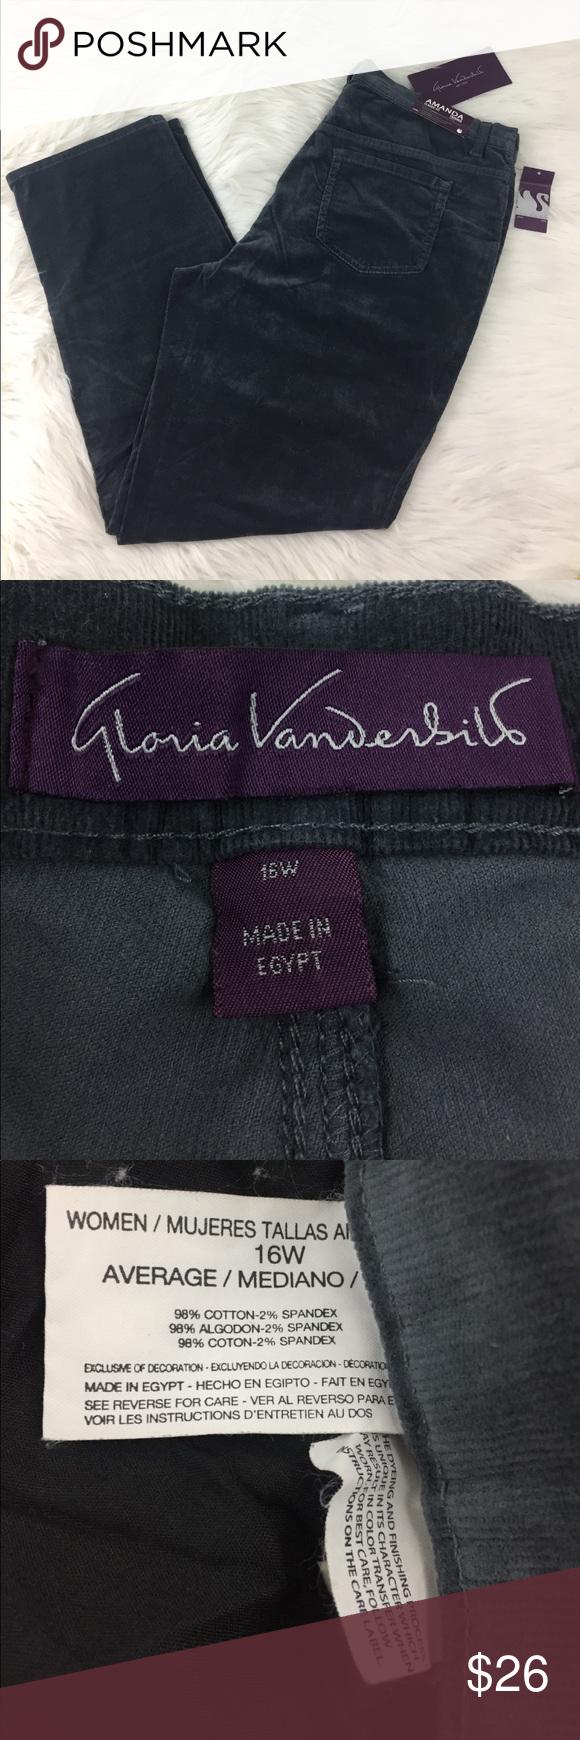 2dbcbfe9262 Gloria Vanderbilt Corduroy Slate Gray Jeans. J5 Gloria Vanderbilt plus size  women s 16 W Slate